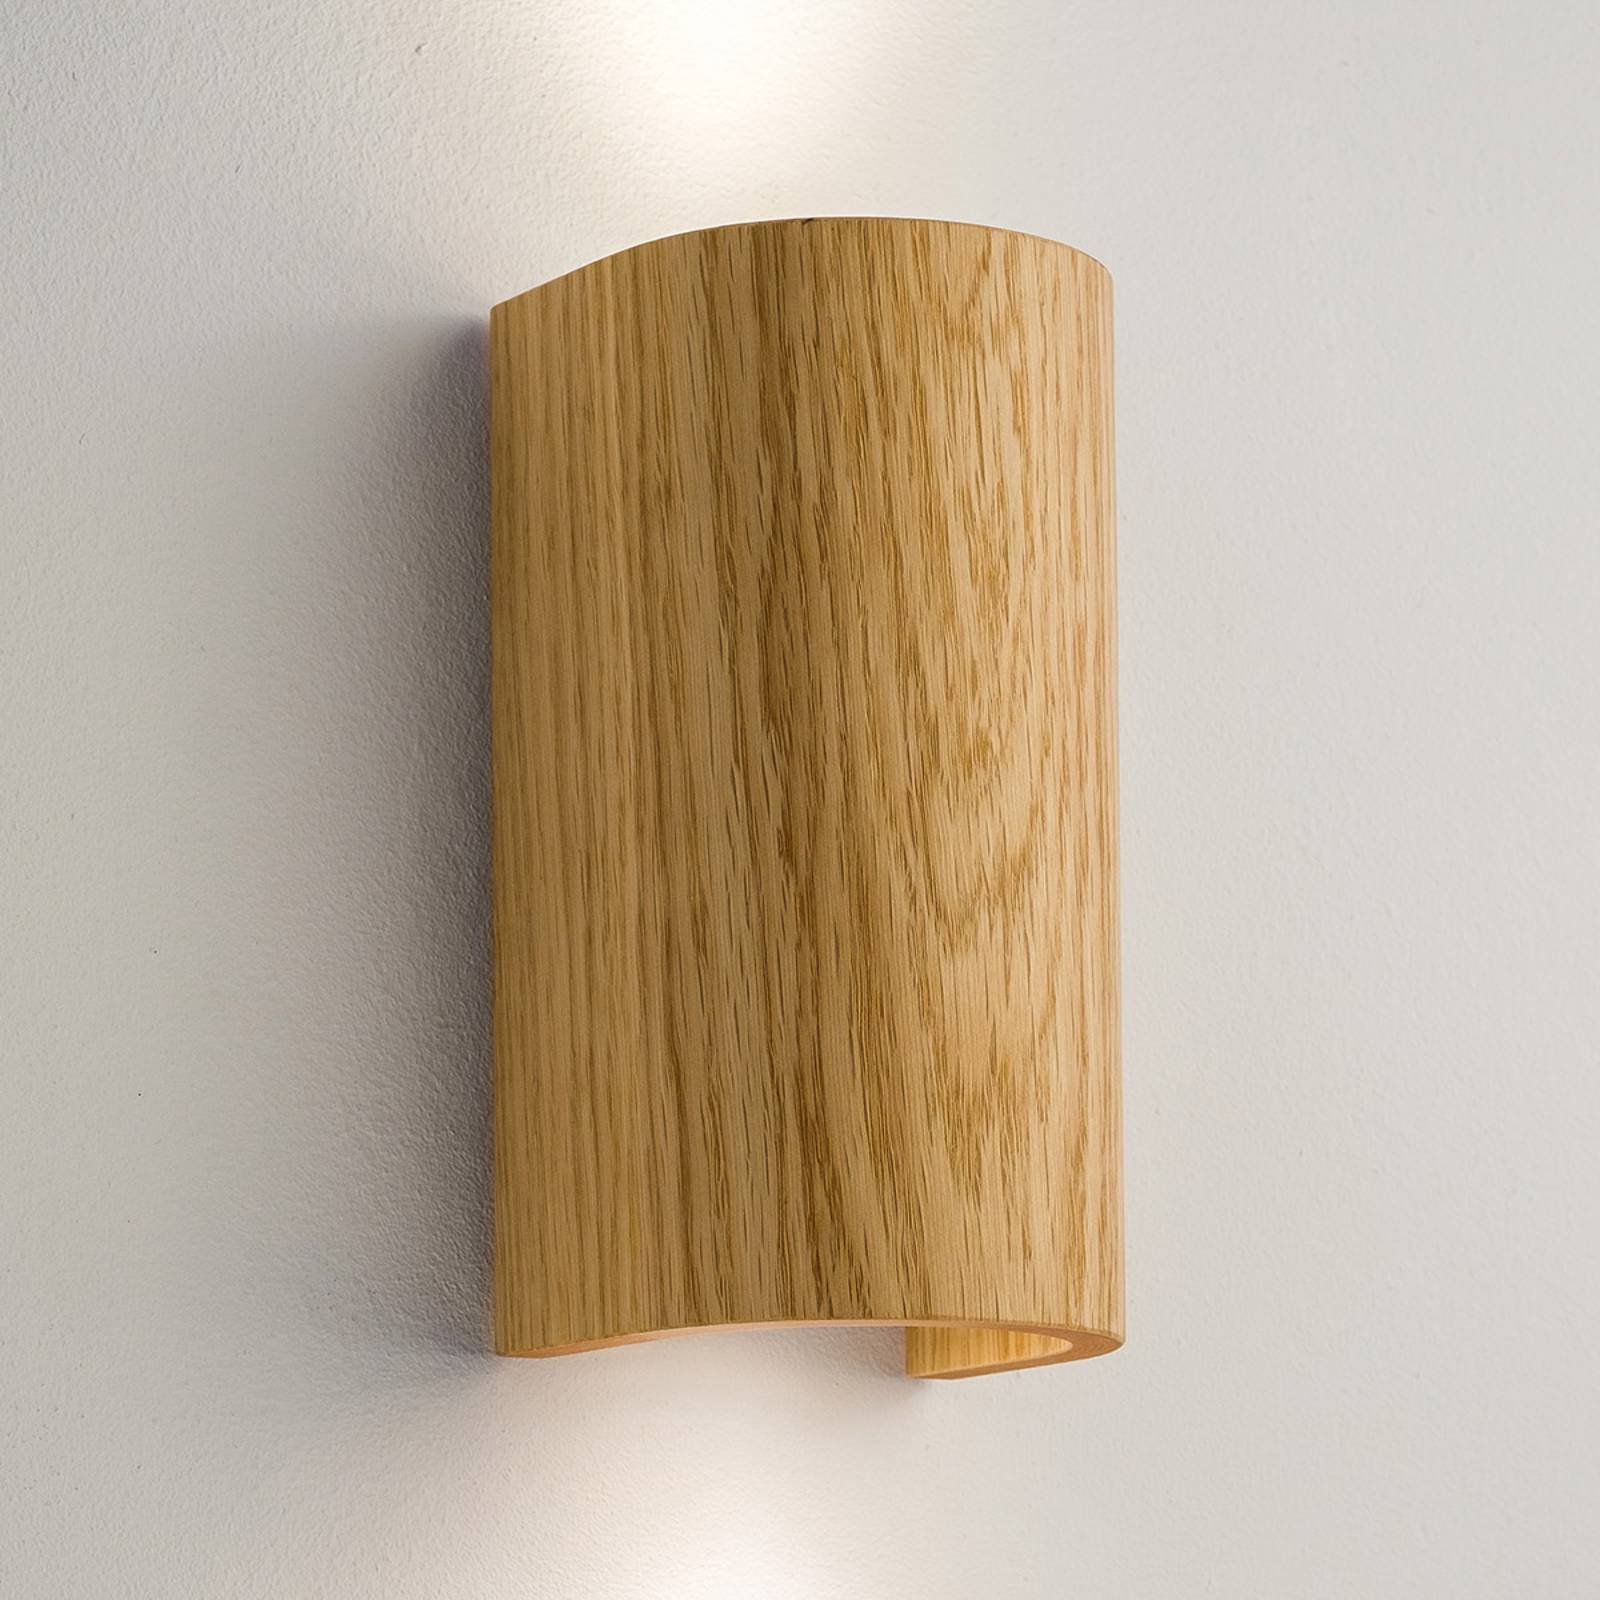 Tube vegglampe i eik 17,5 cm